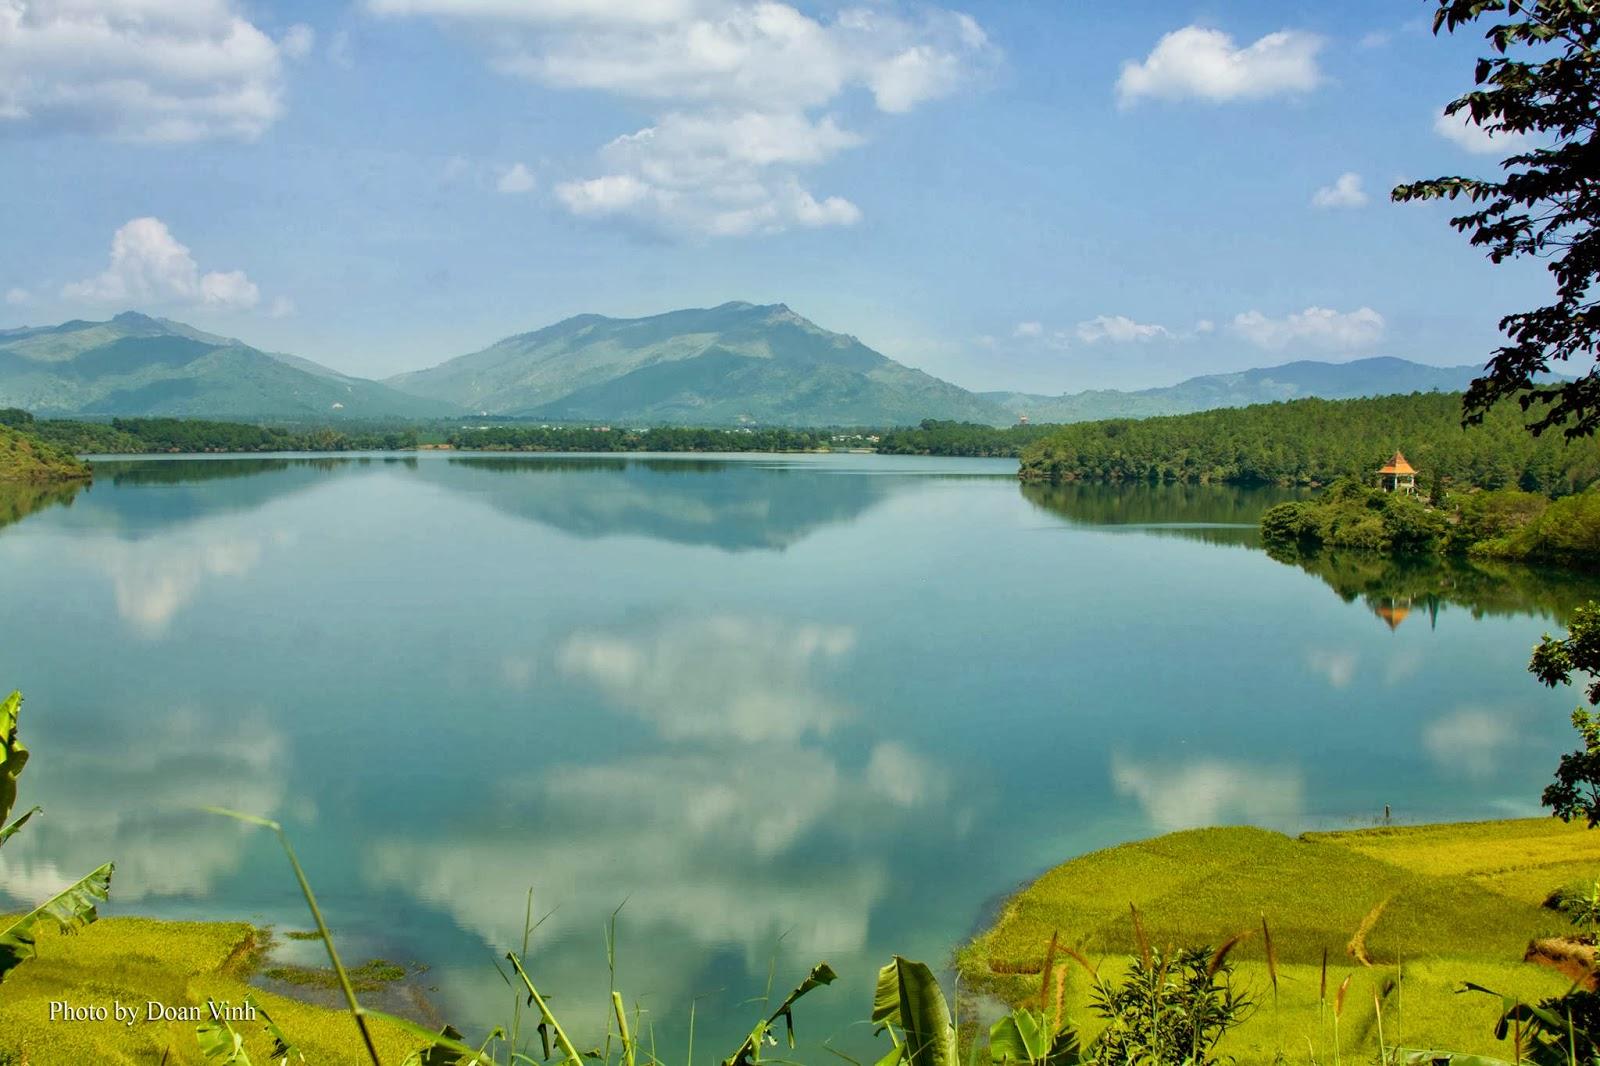 Vietnam's most beautiful lakes